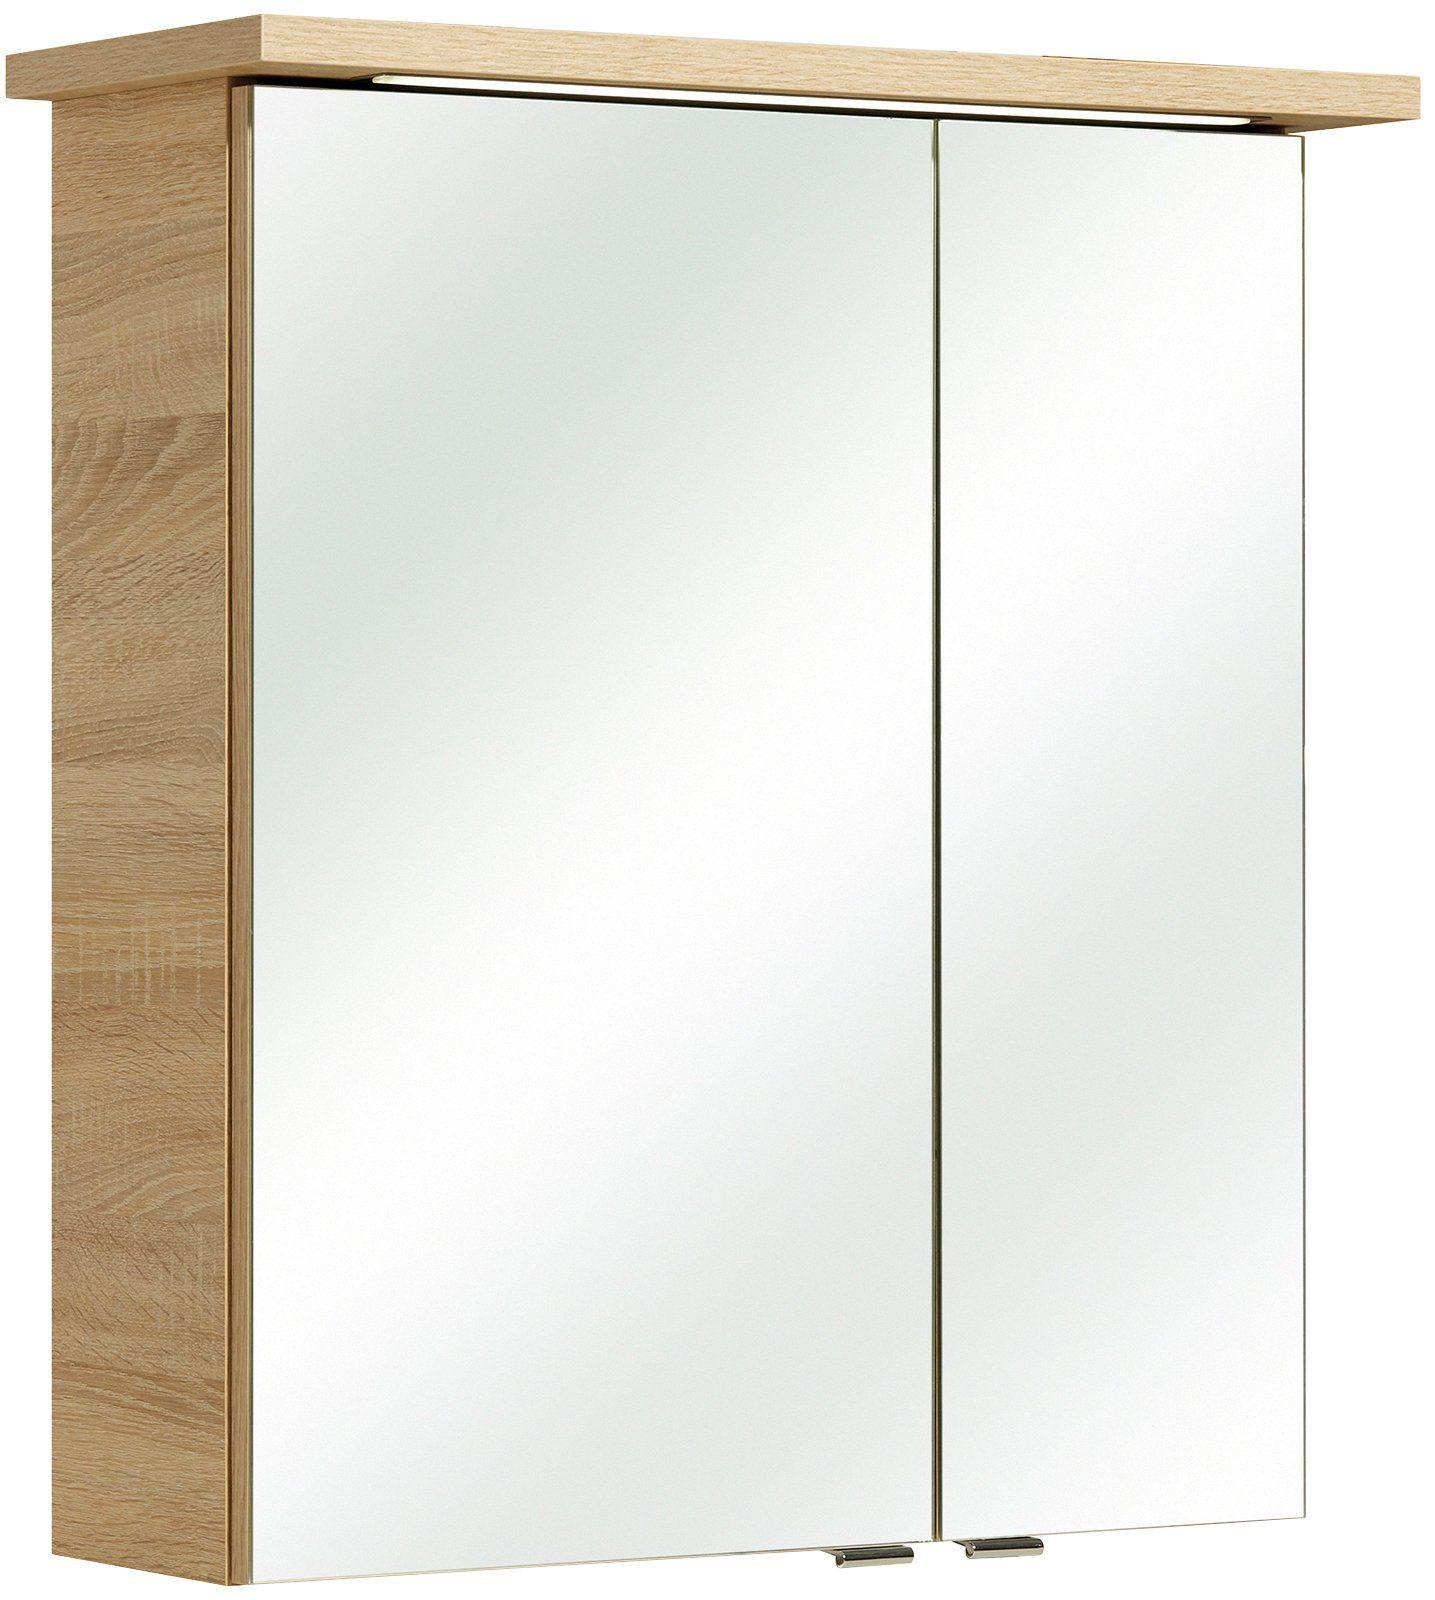 PELIPAL Spiegelschrank »Selva«, LED, Breite 60 cm